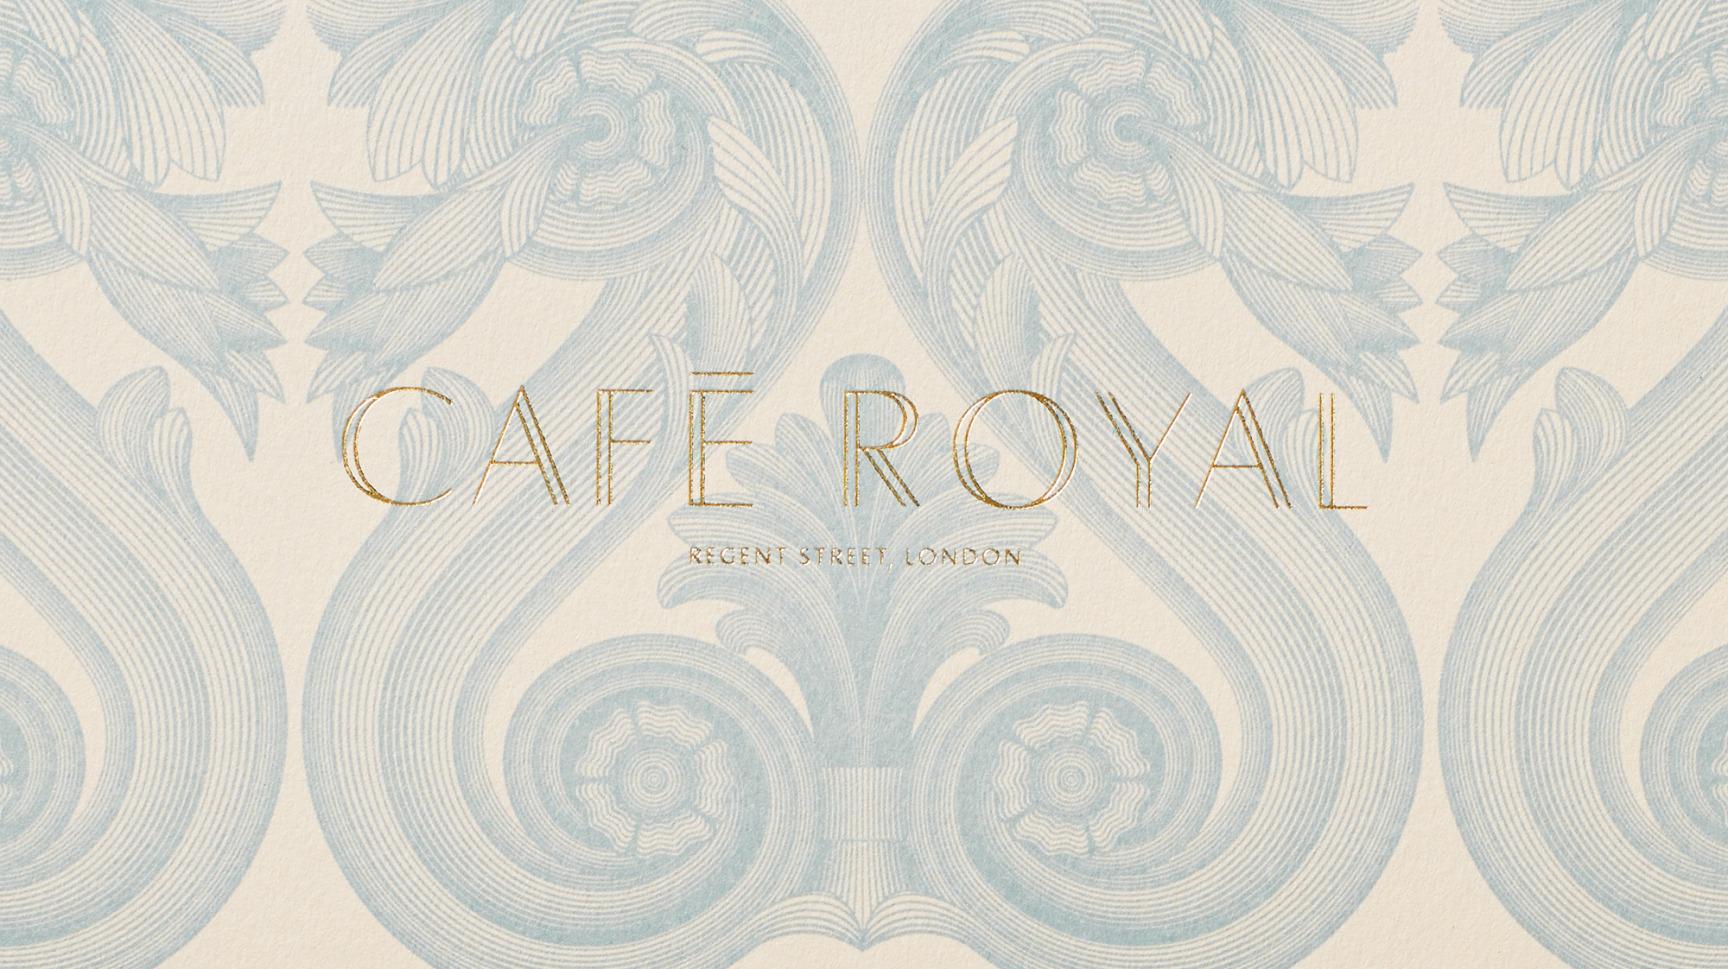 Kam Tang<br /><strong>Cafe Royal</strong>